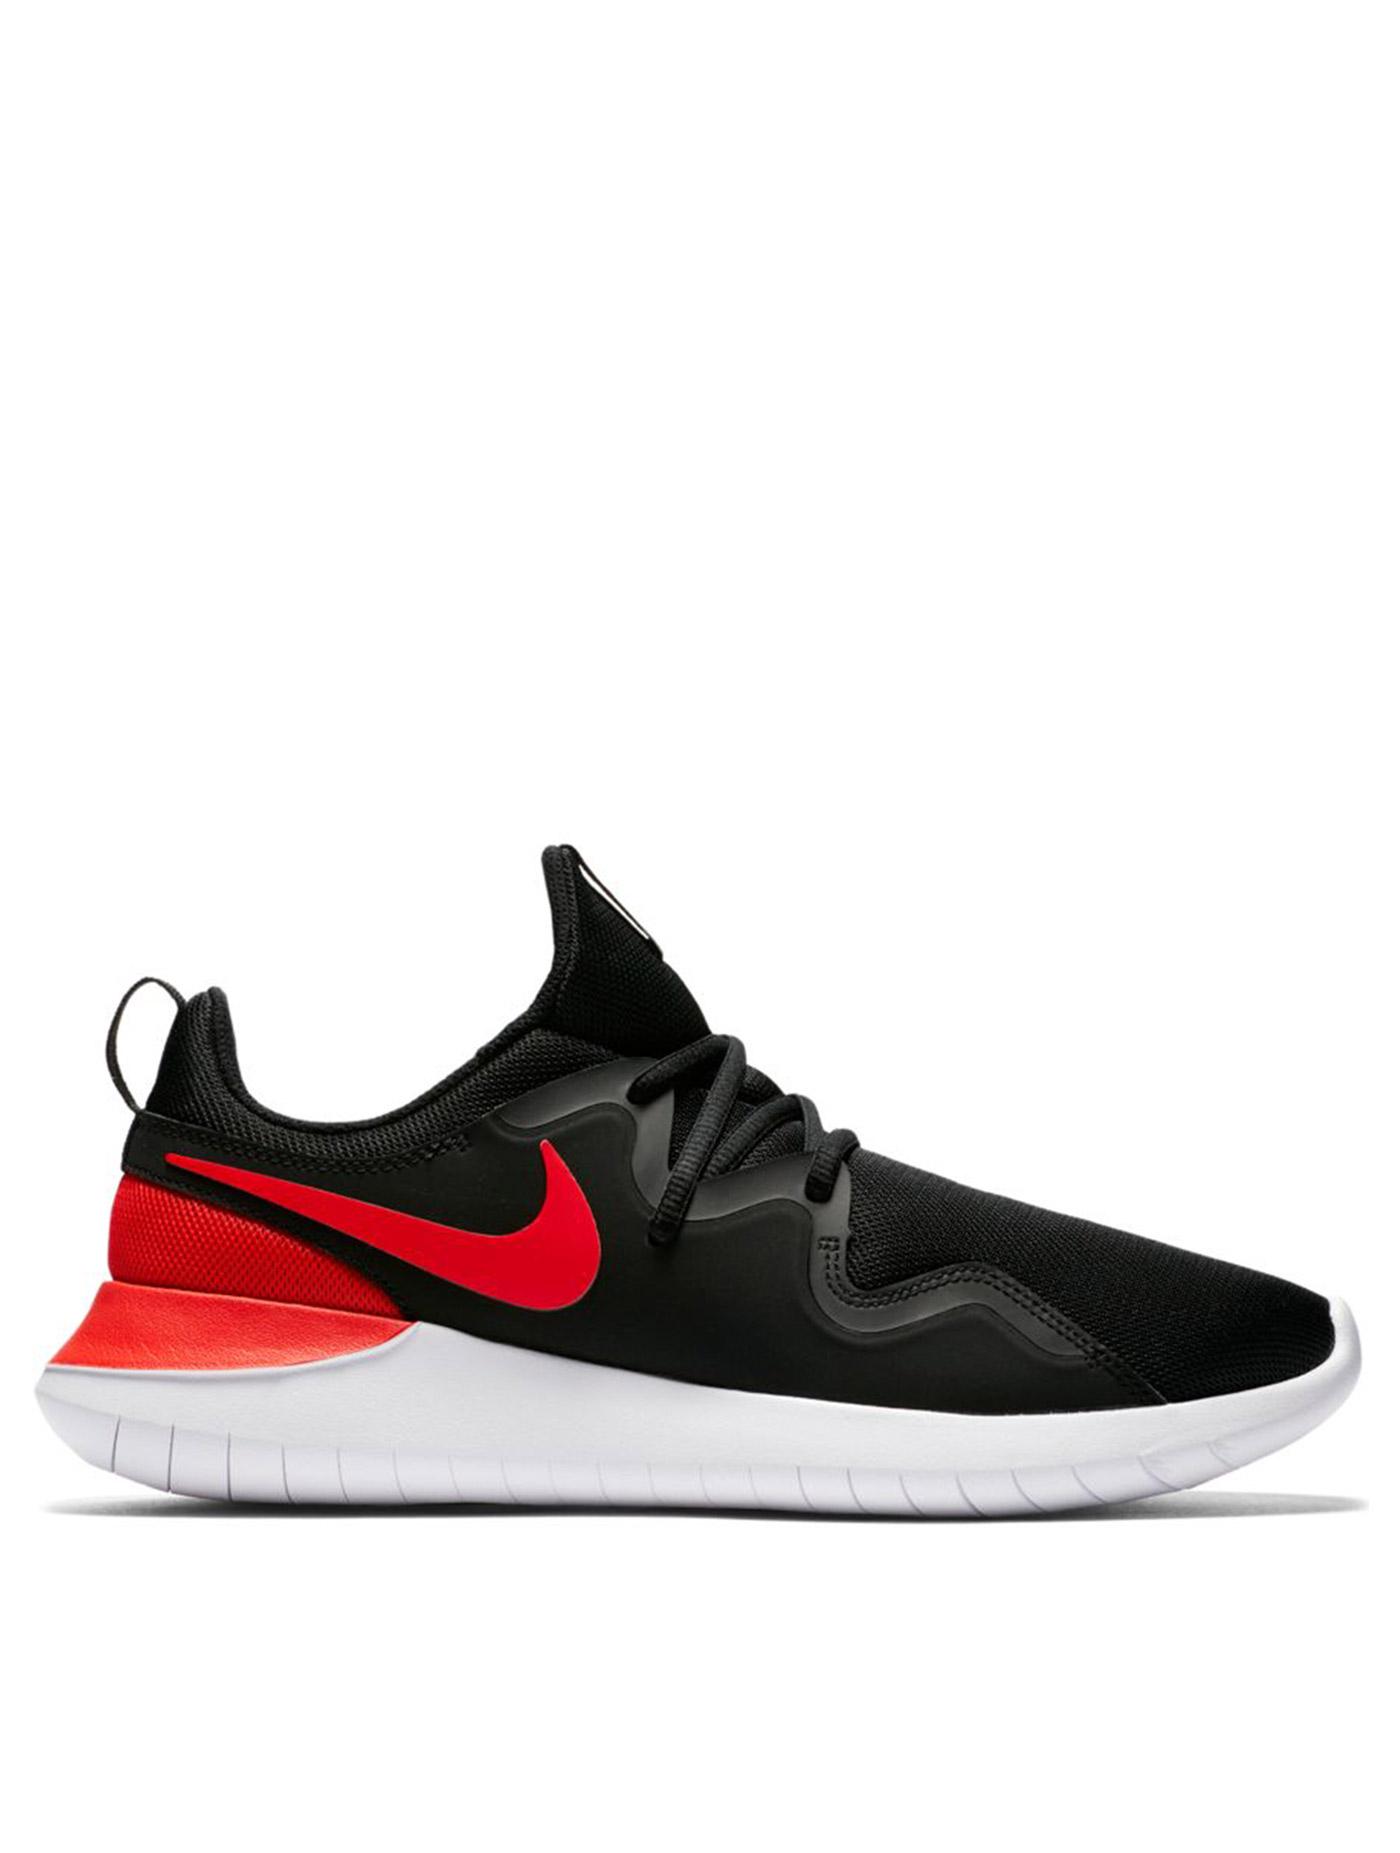 b525a25e134d1 Men s Sneakers Black Red Size 10.5